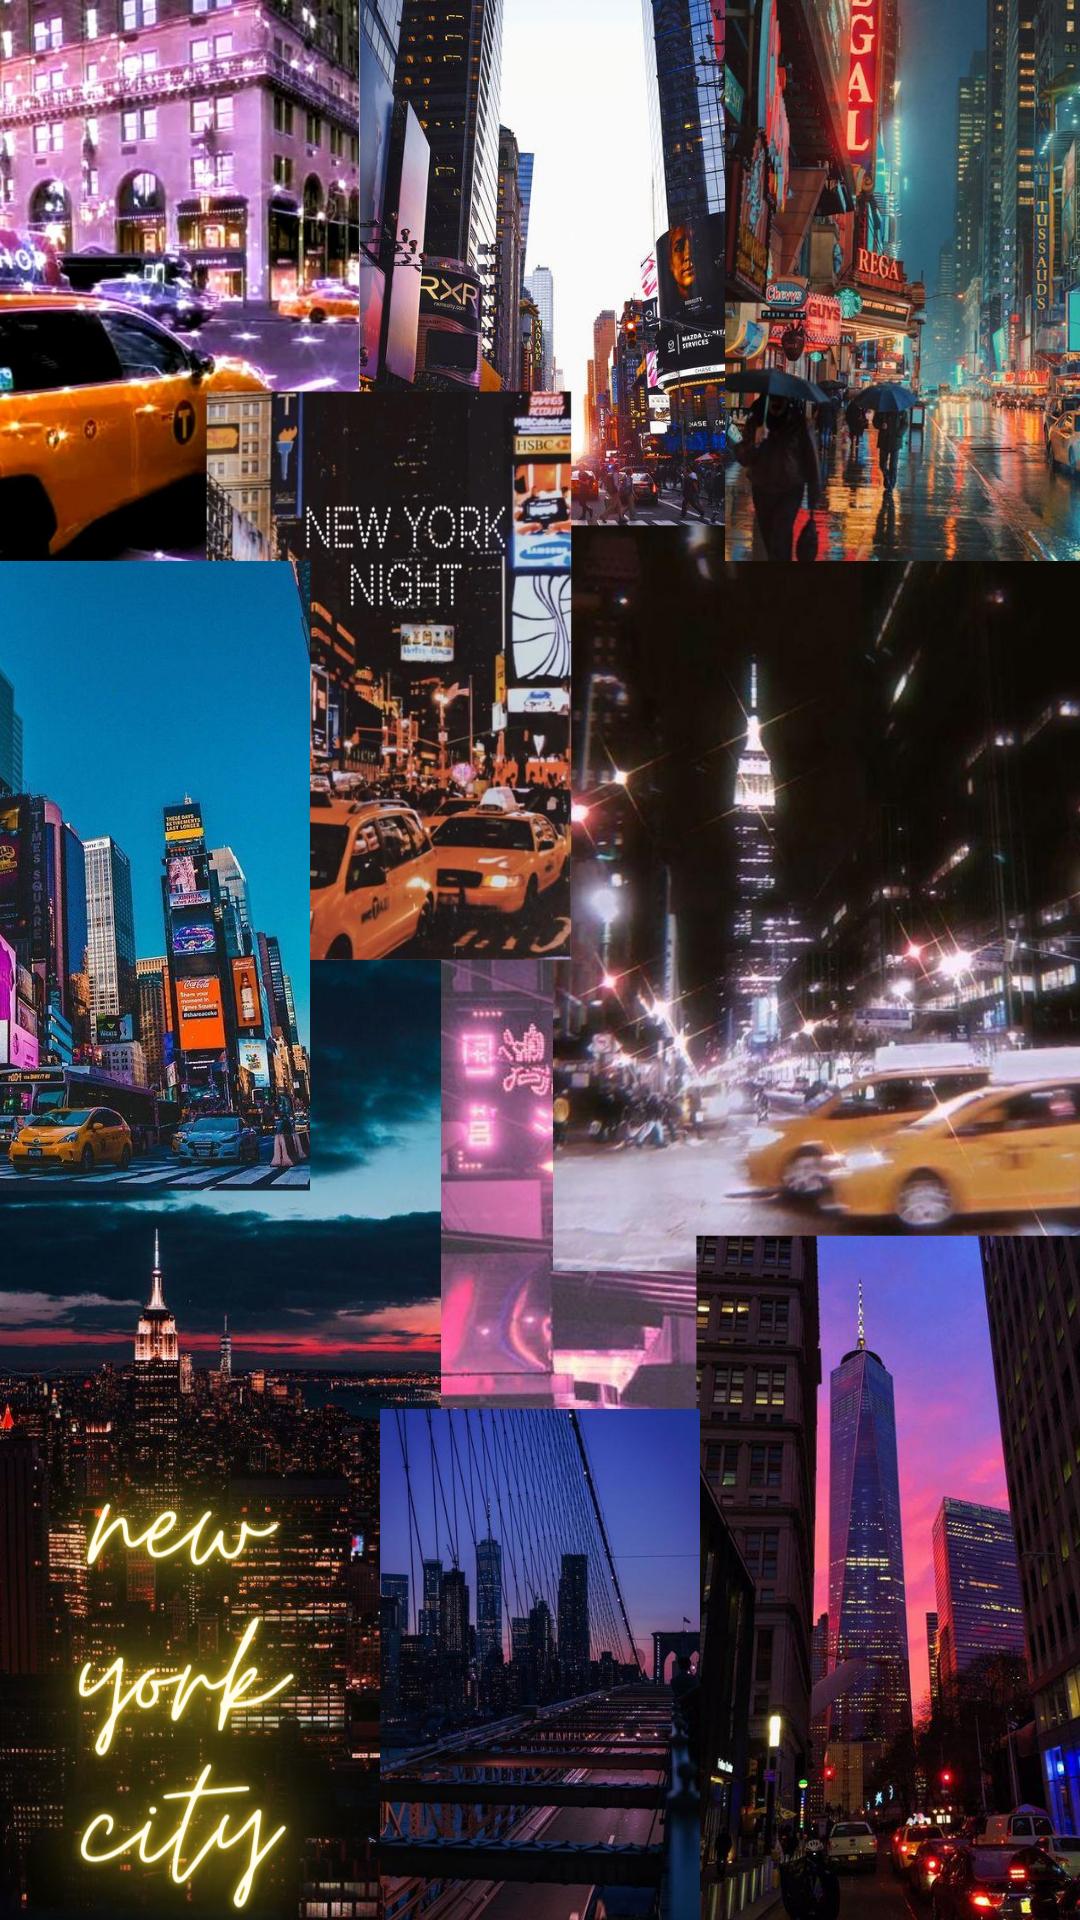 New York City Aesthetic New York Wallpaper New York Pictures New York Poster